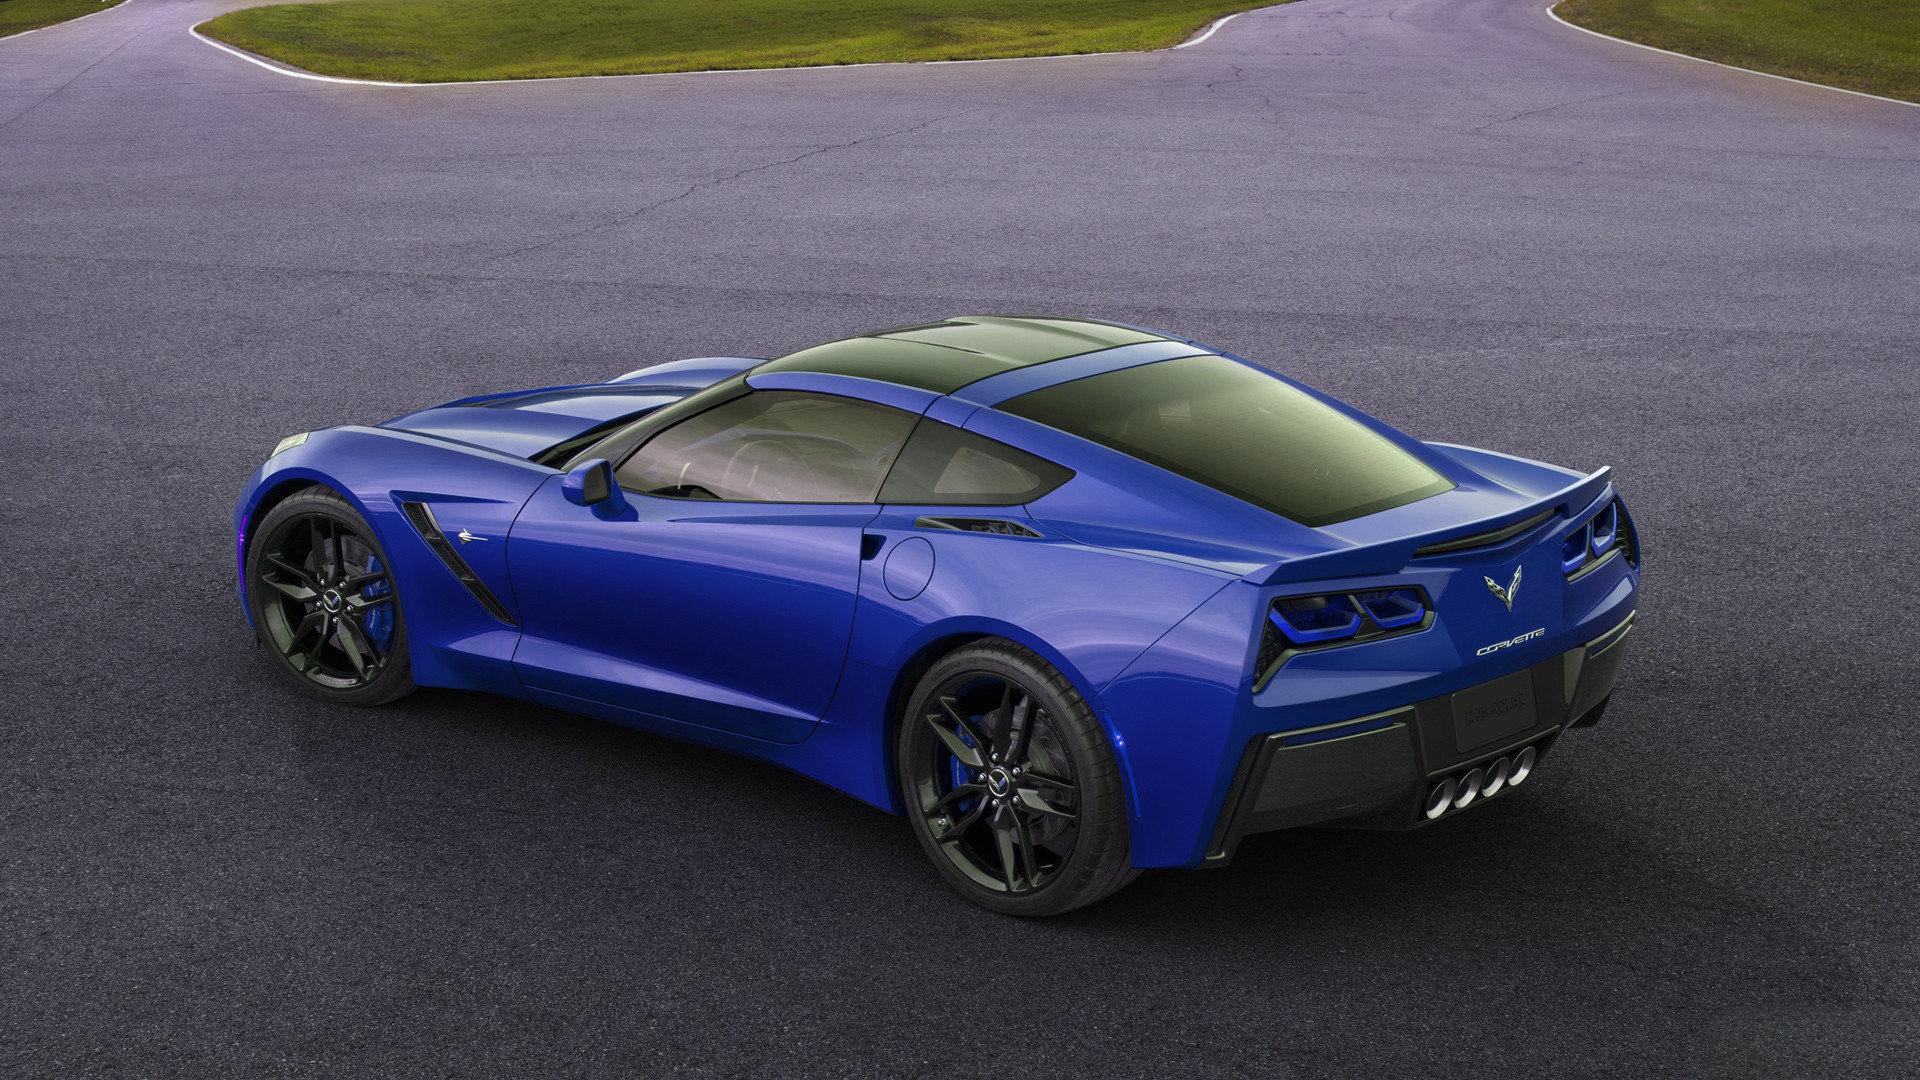 Corvette Stingray 2014 Wallpaper 1920×1080 #25340 HD Wallpaper ...